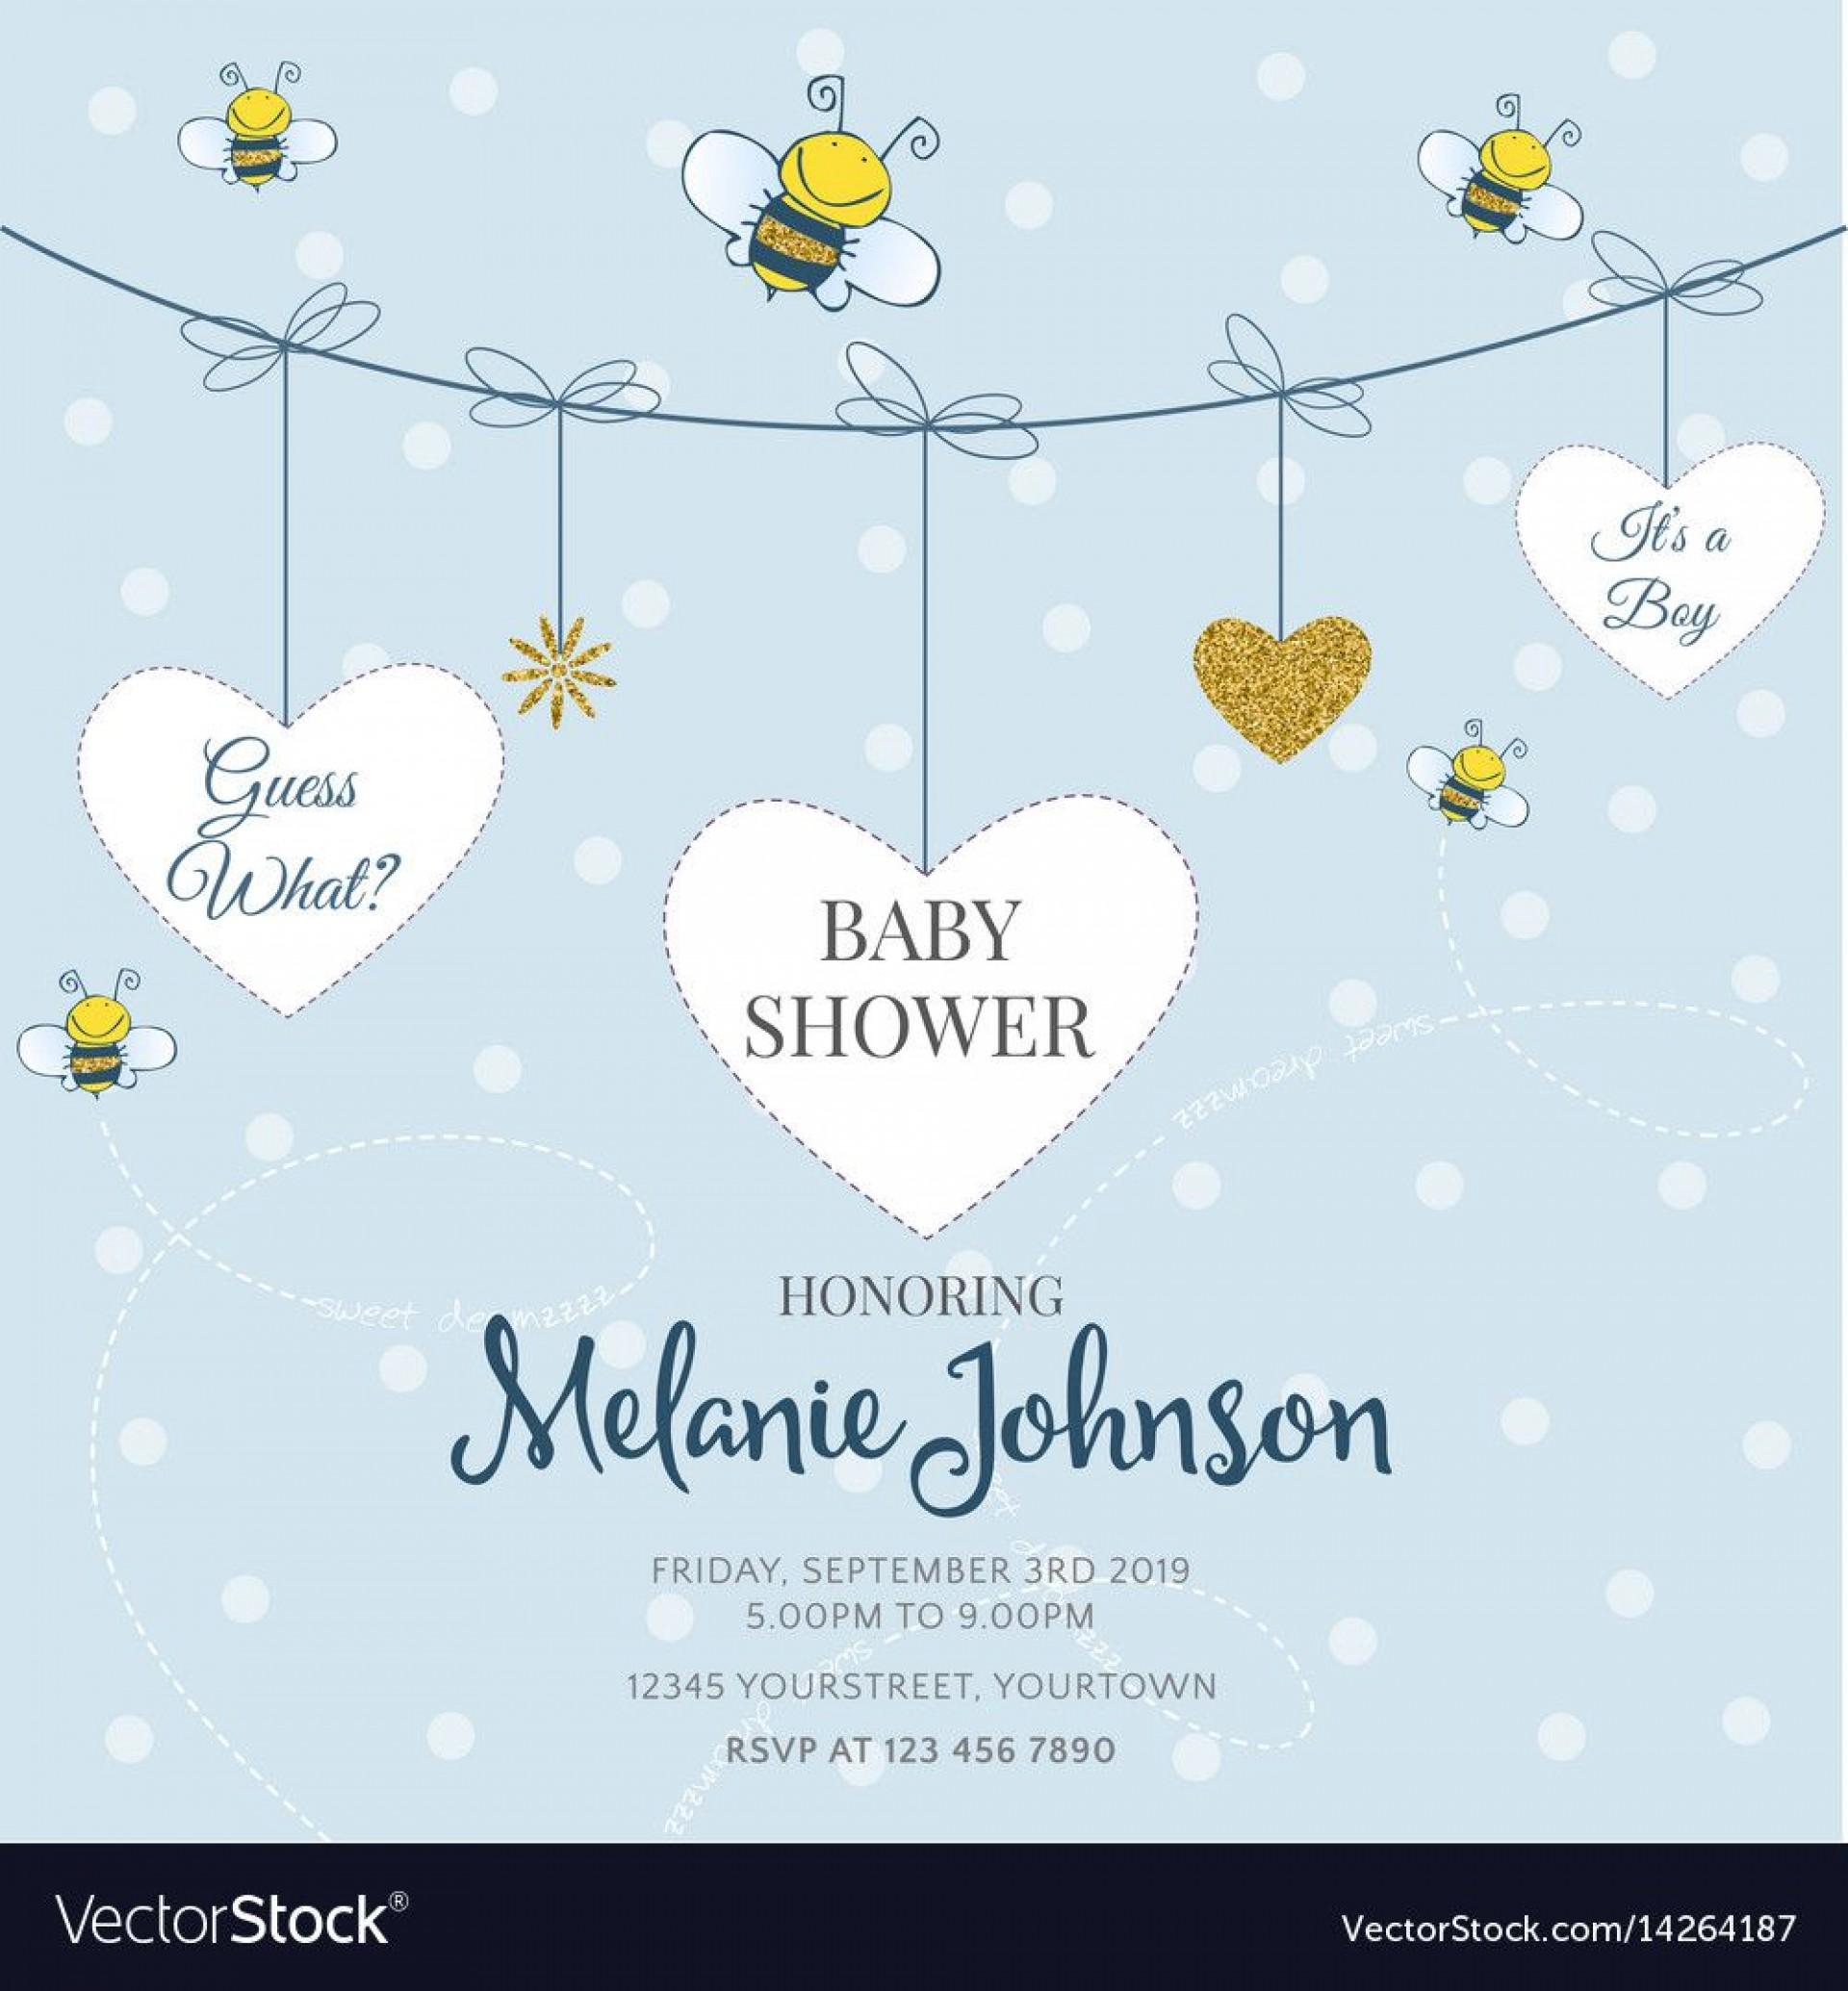 009 Sensational Baby Shower Card Template Idea  Microsoft Word Invitation Design Online Printable Free1920